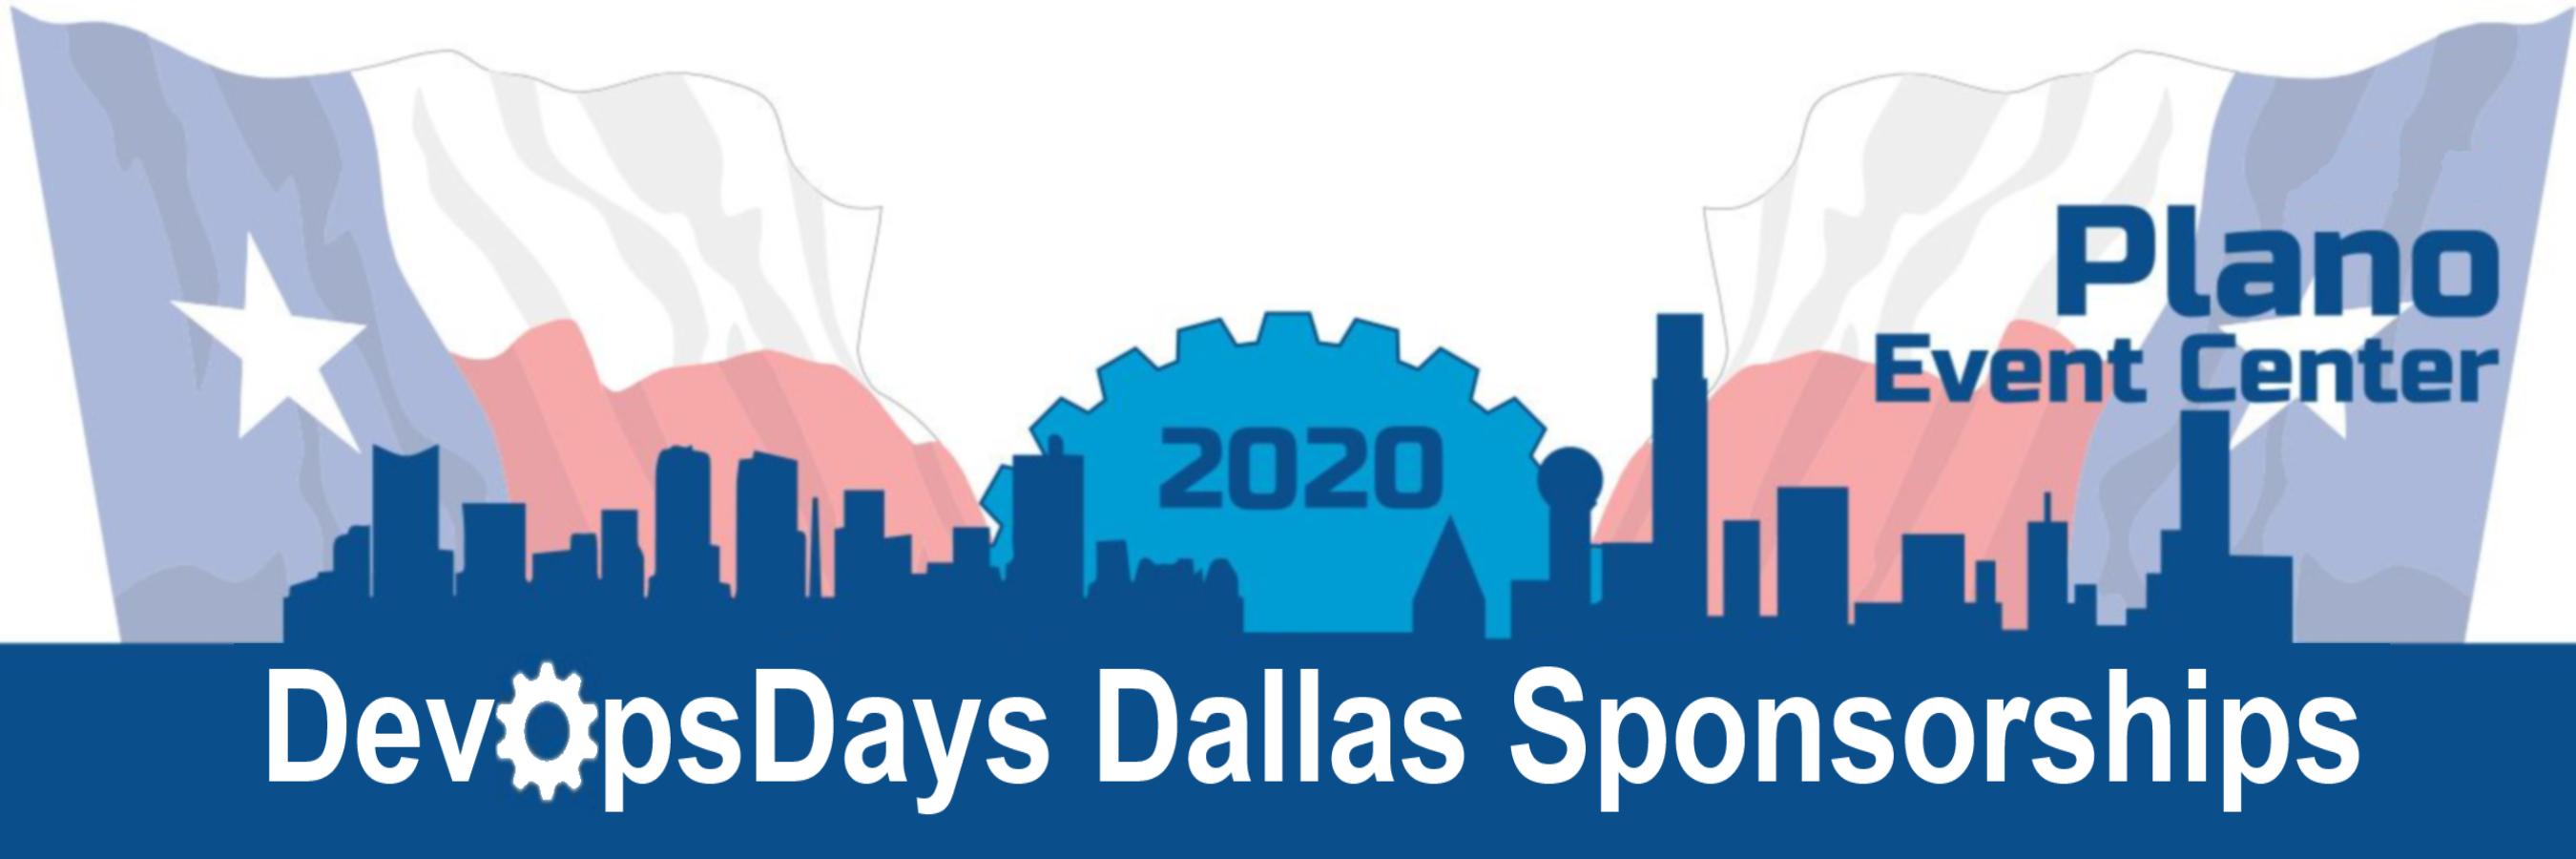 DevOpsDays Dallas 2020